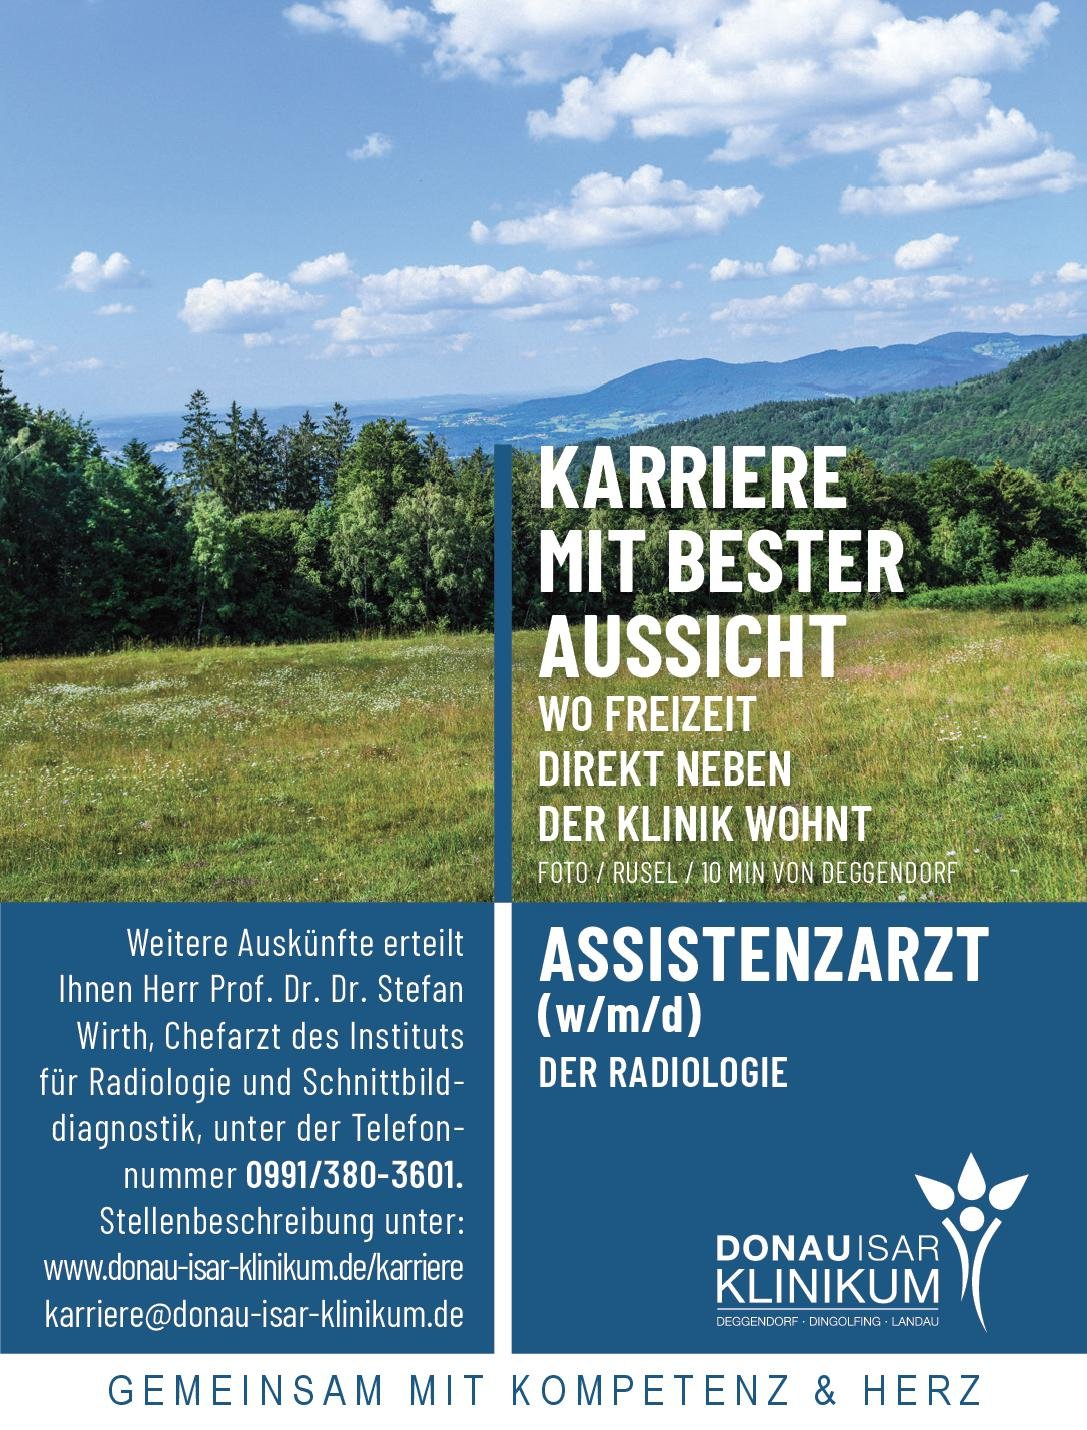 Donauisar Klinikum Deggendorf - Dingolfing - Landau Assistenzarzt (w/m/d) der Radiologie  Radiologie, Radiologie Assistenzarzt / Arzt in Weiterbildung